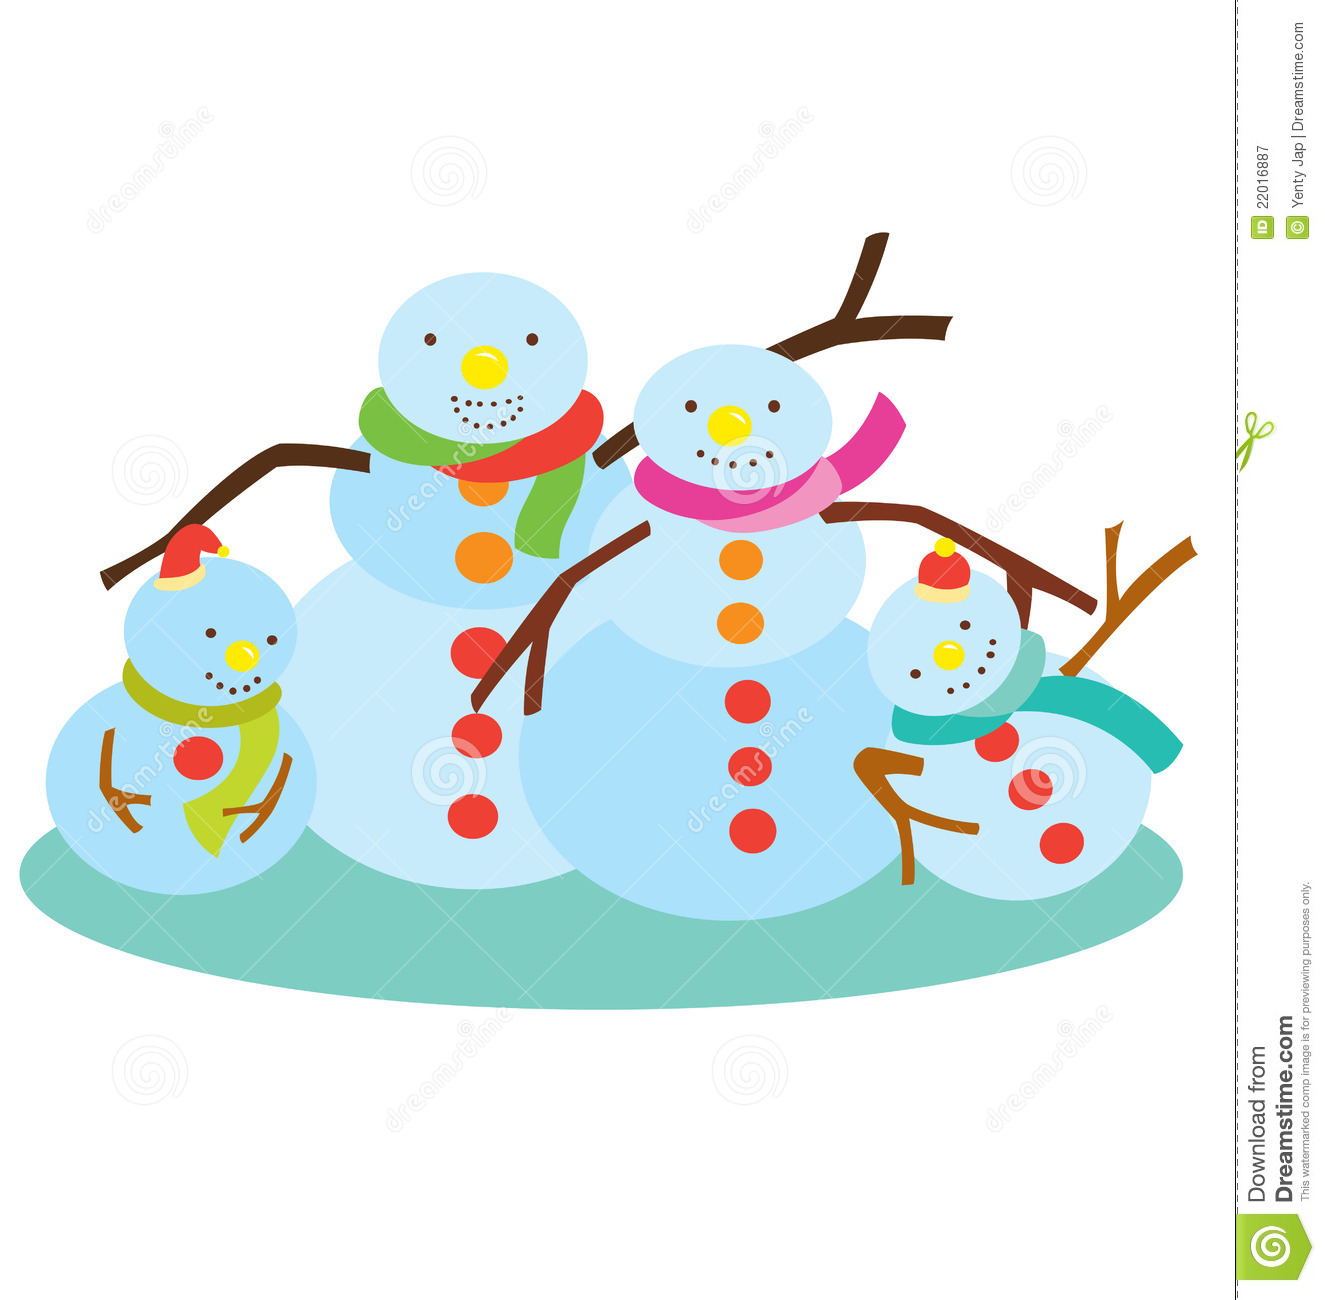 snowman family clip art free - photo #5